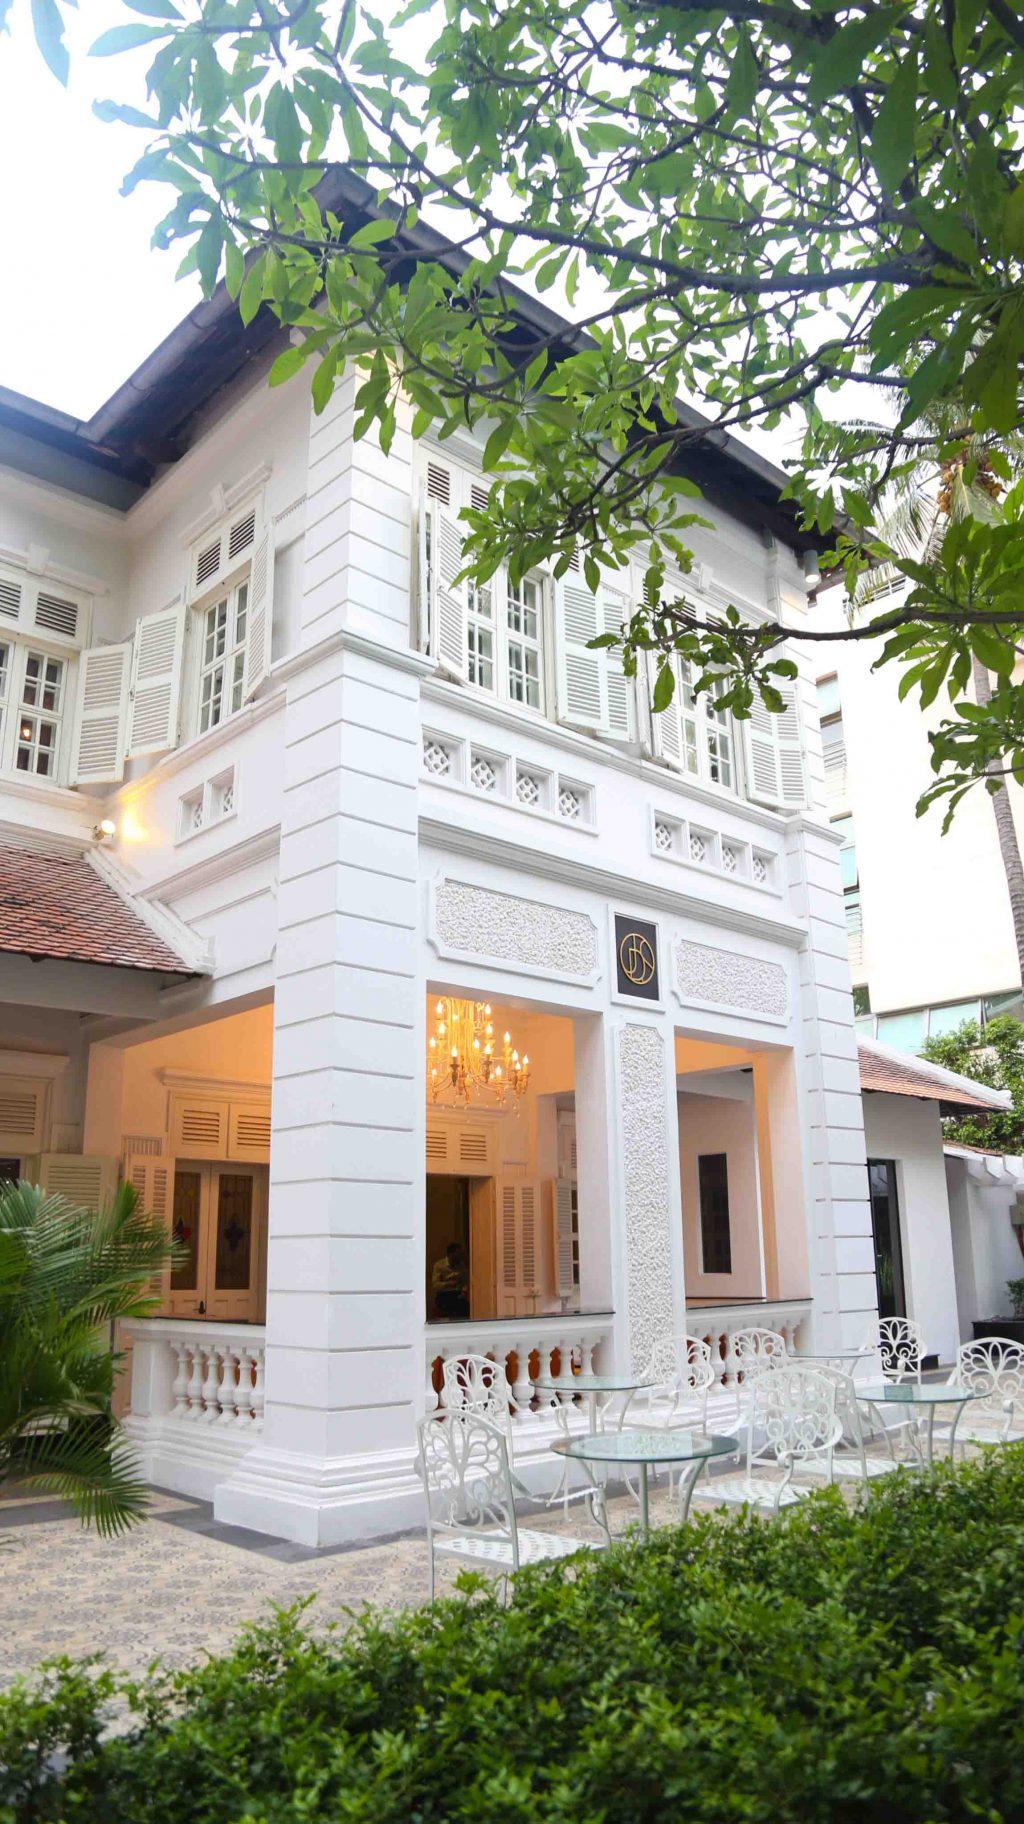 villa nhà hàng Jardin Des Sens Saigon